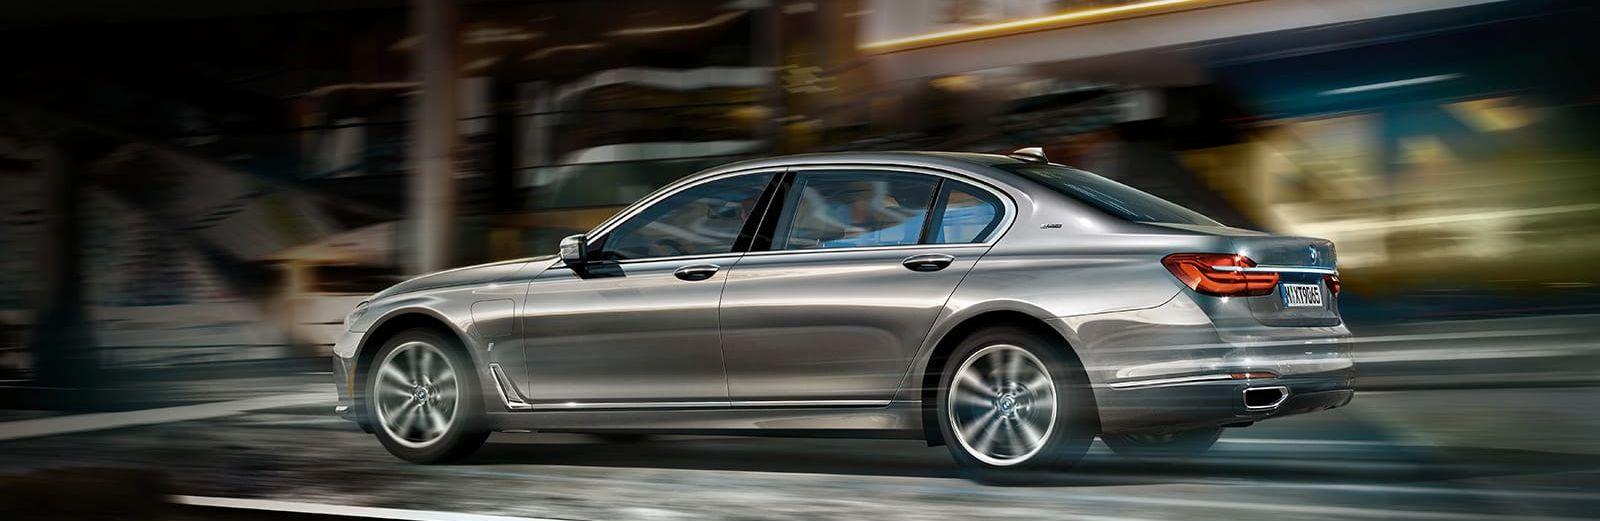 2019 BMW 7 Series for Sale near Dallas, TX